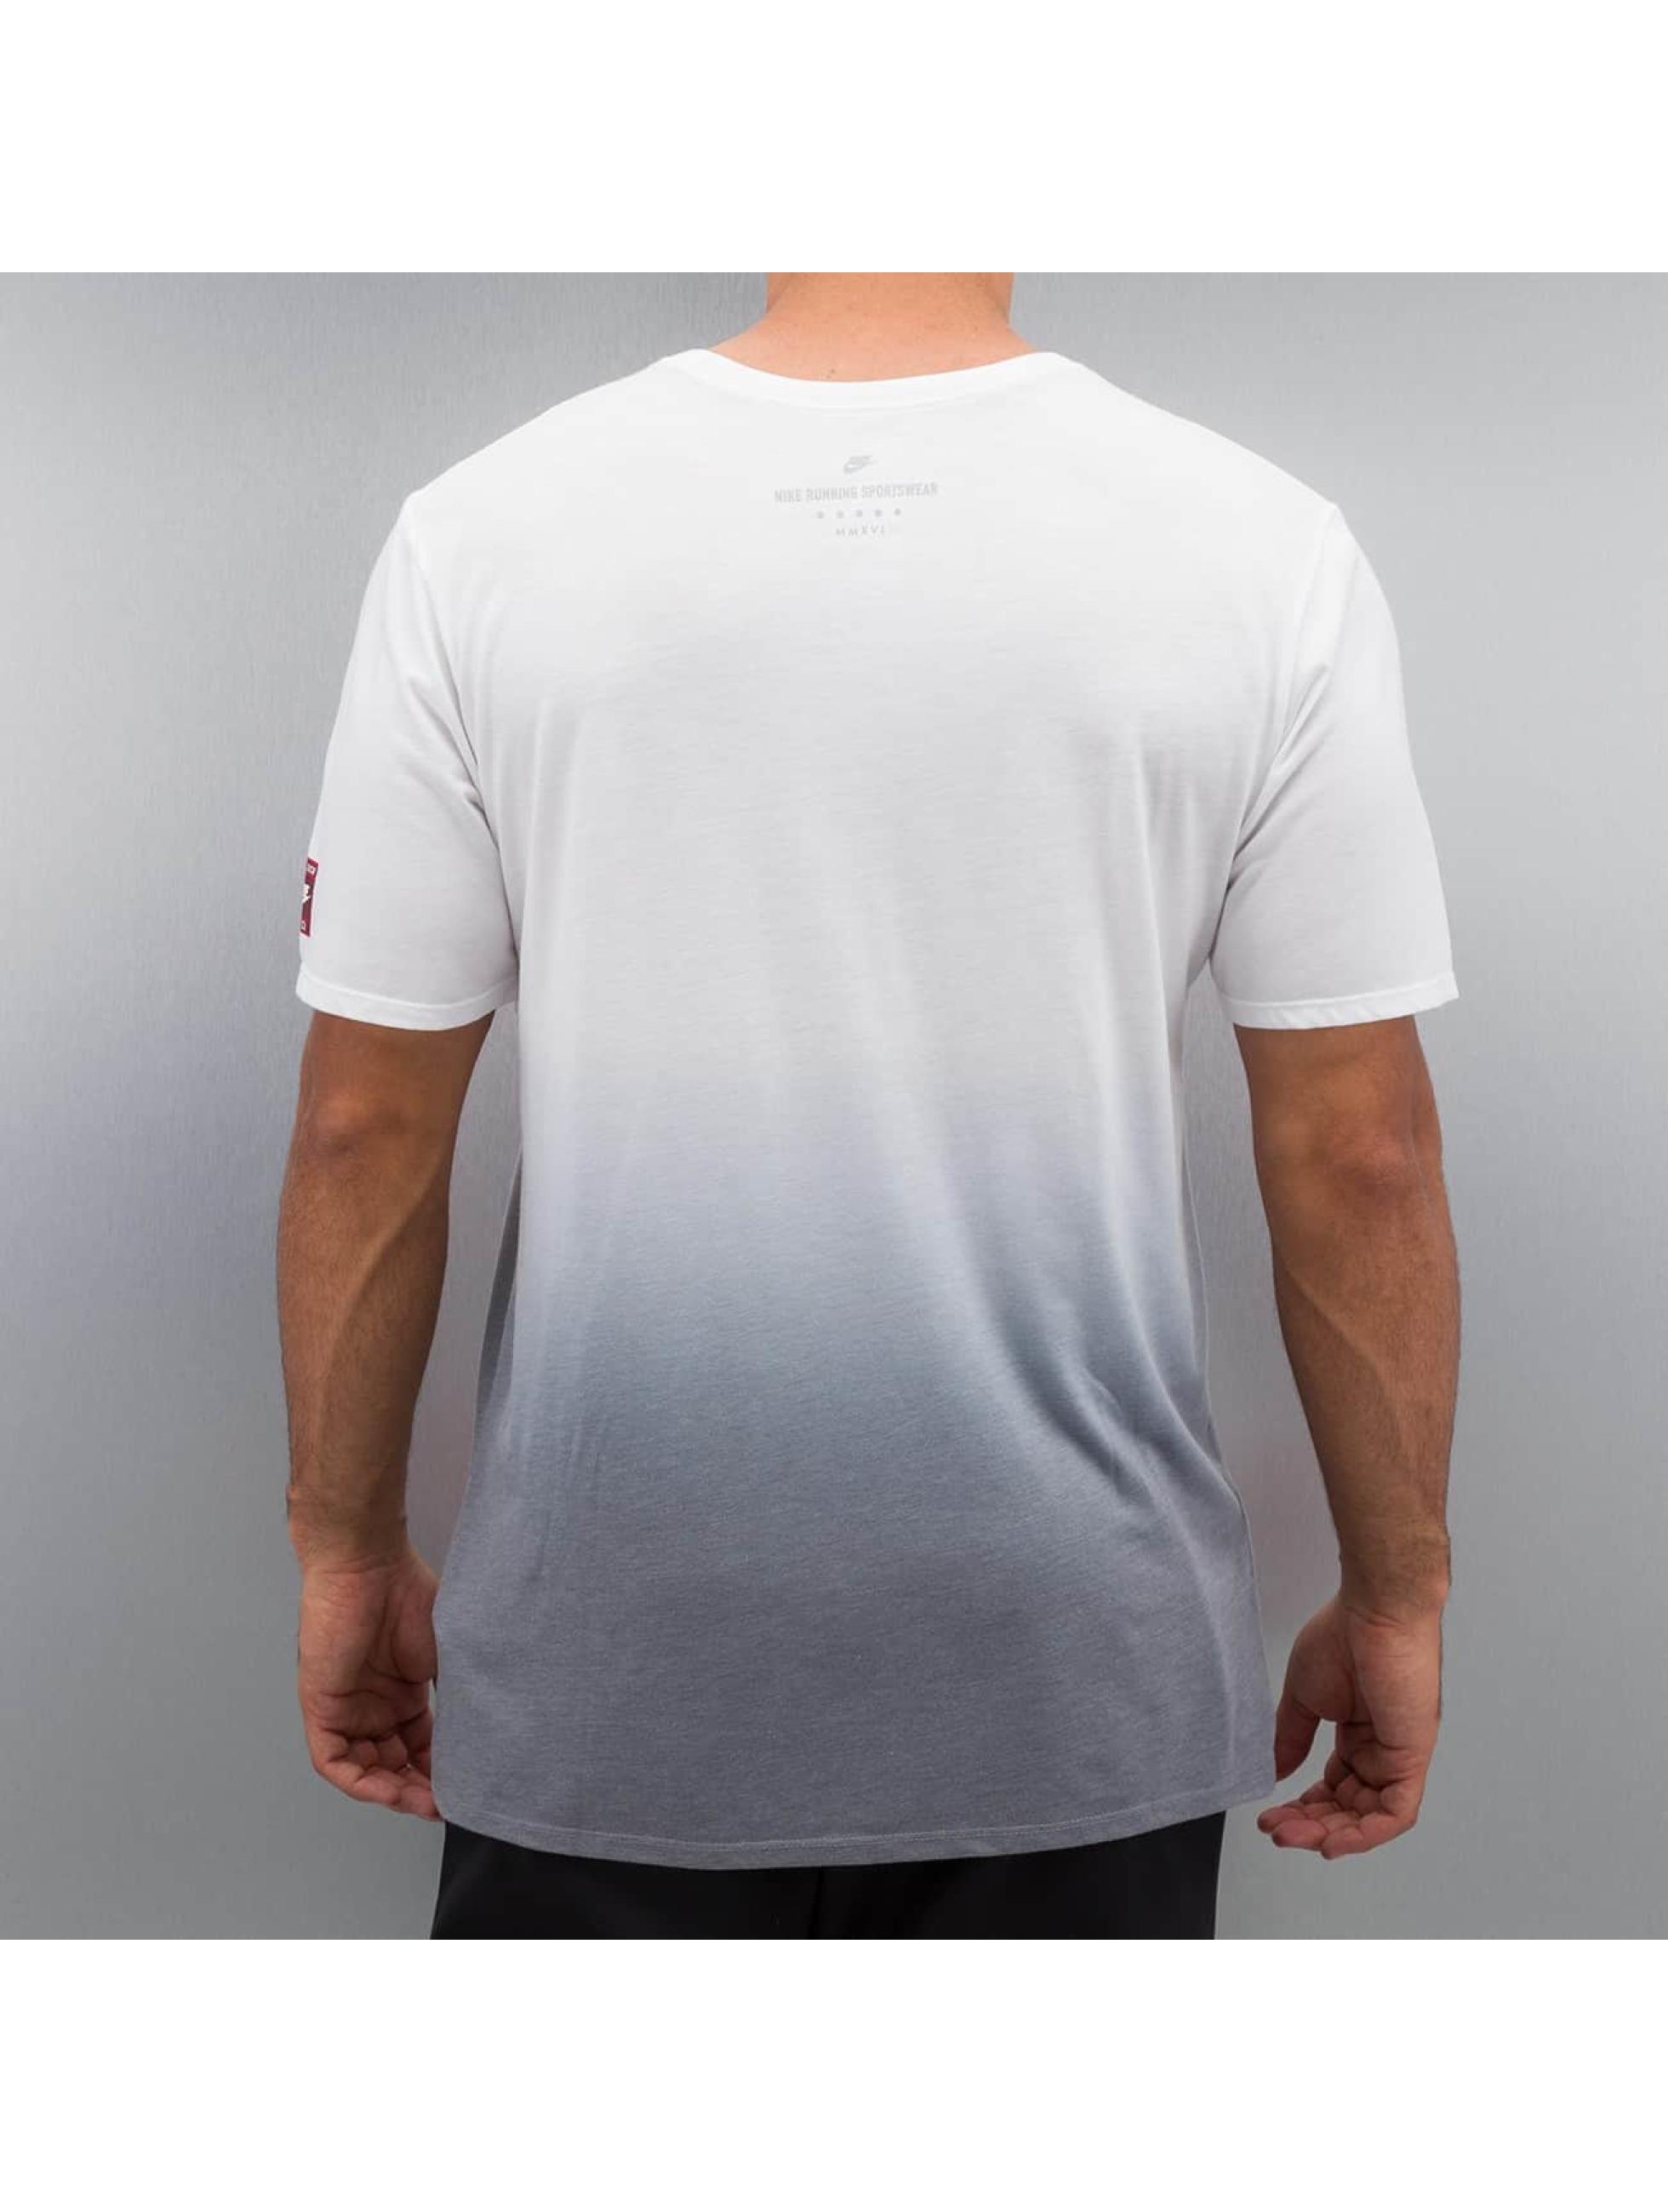 Nike T-shirt S Am Story 1 grå